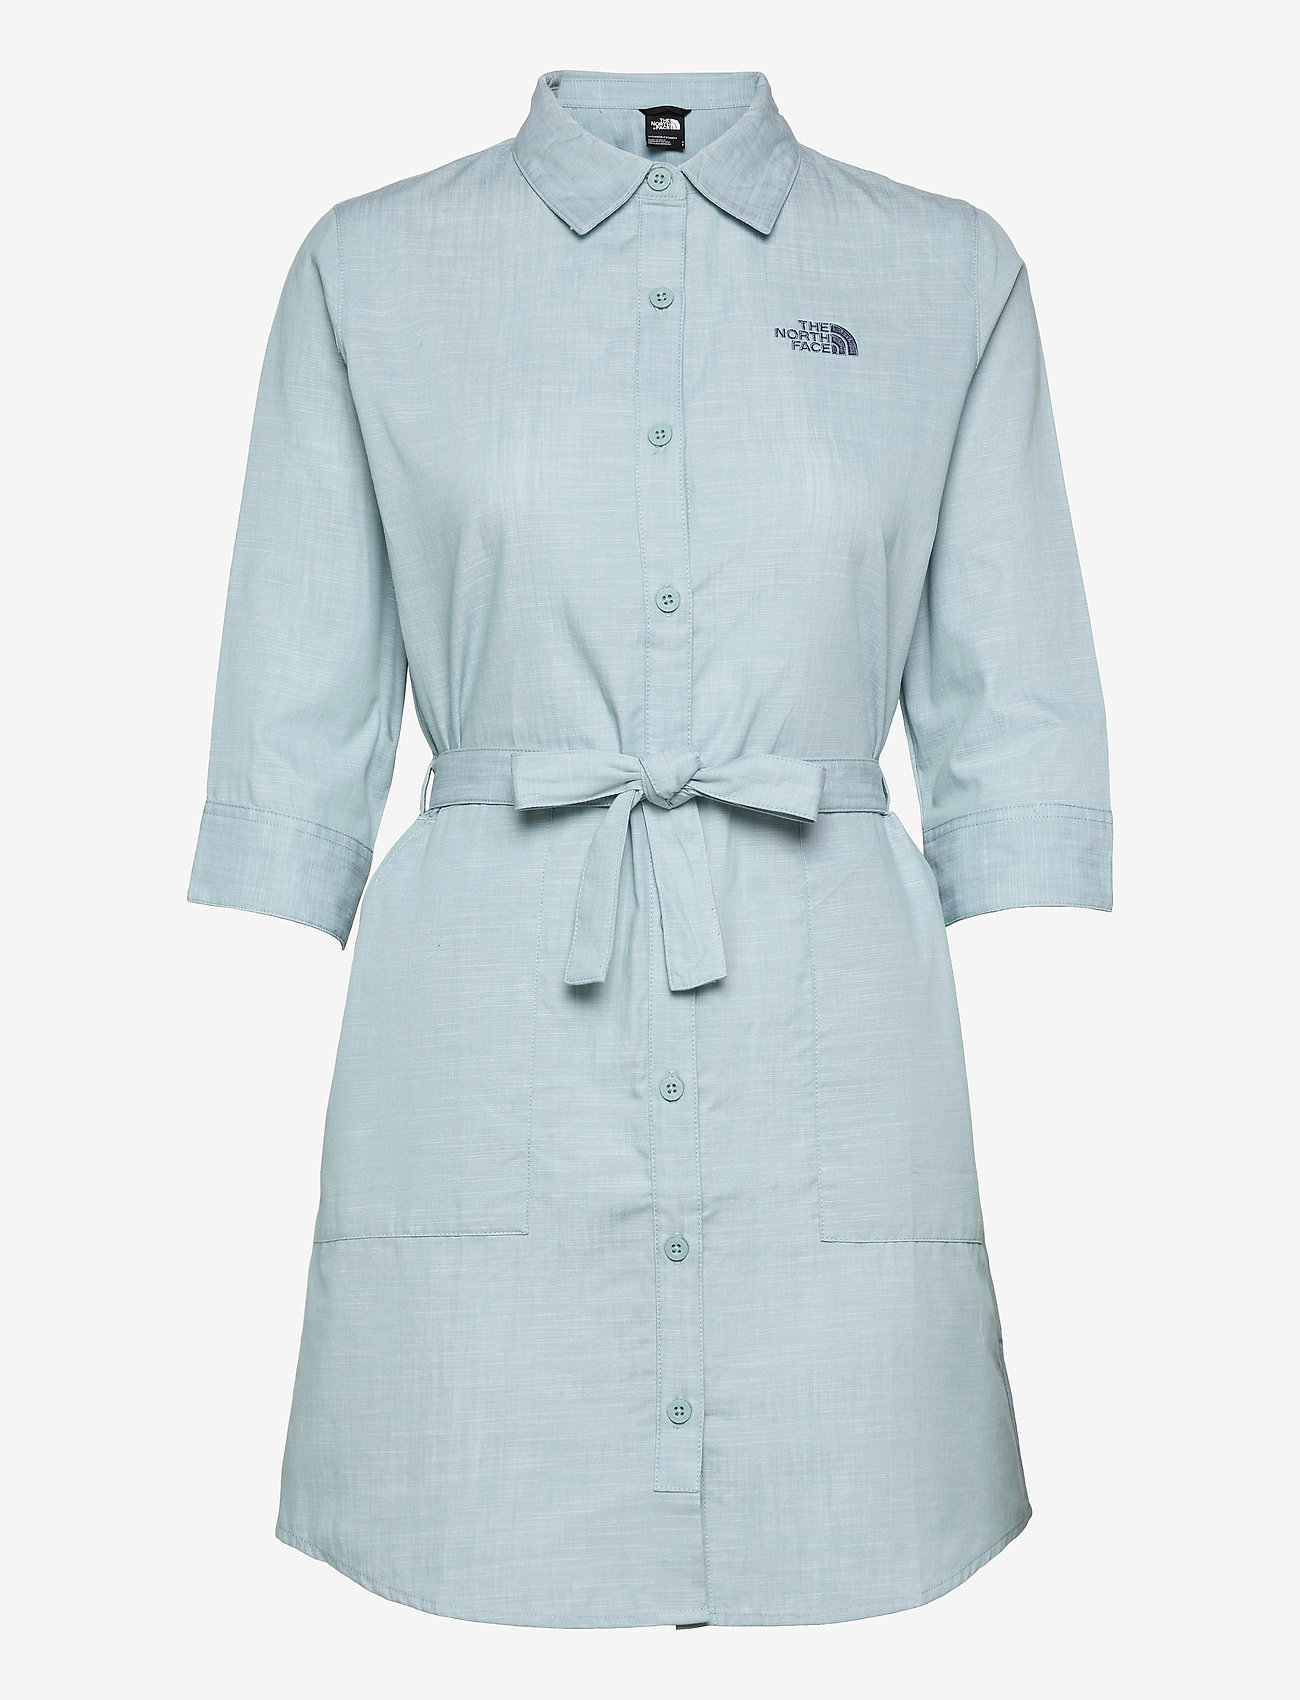 The North Face - W BERNINA DRESS - sommerkjoler - tourmaline blue chambray - 0